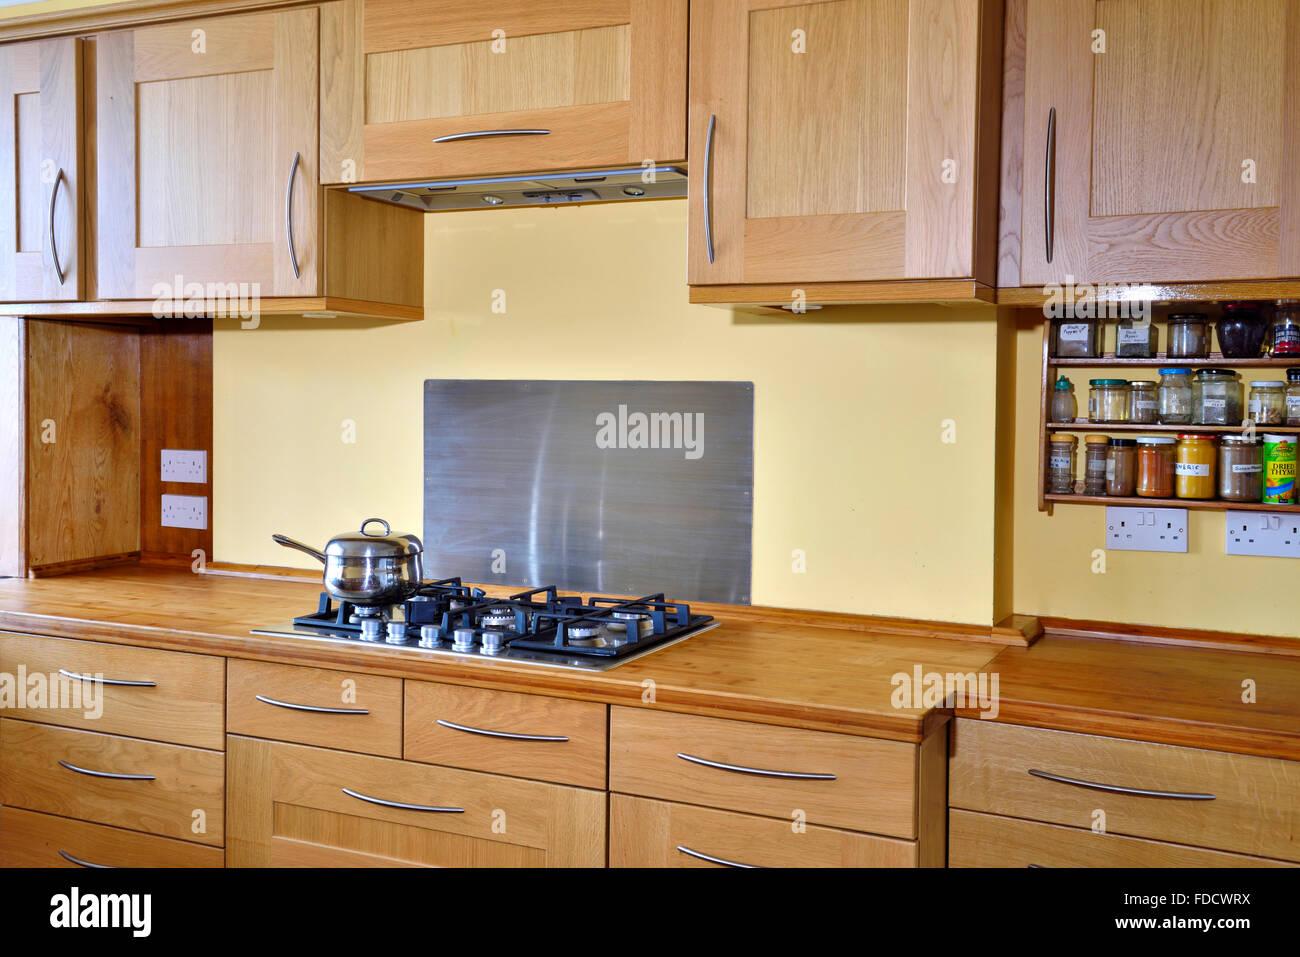 Cupboards Drawers Stockfotos & Cupboards Drawers Bilder - Alamy